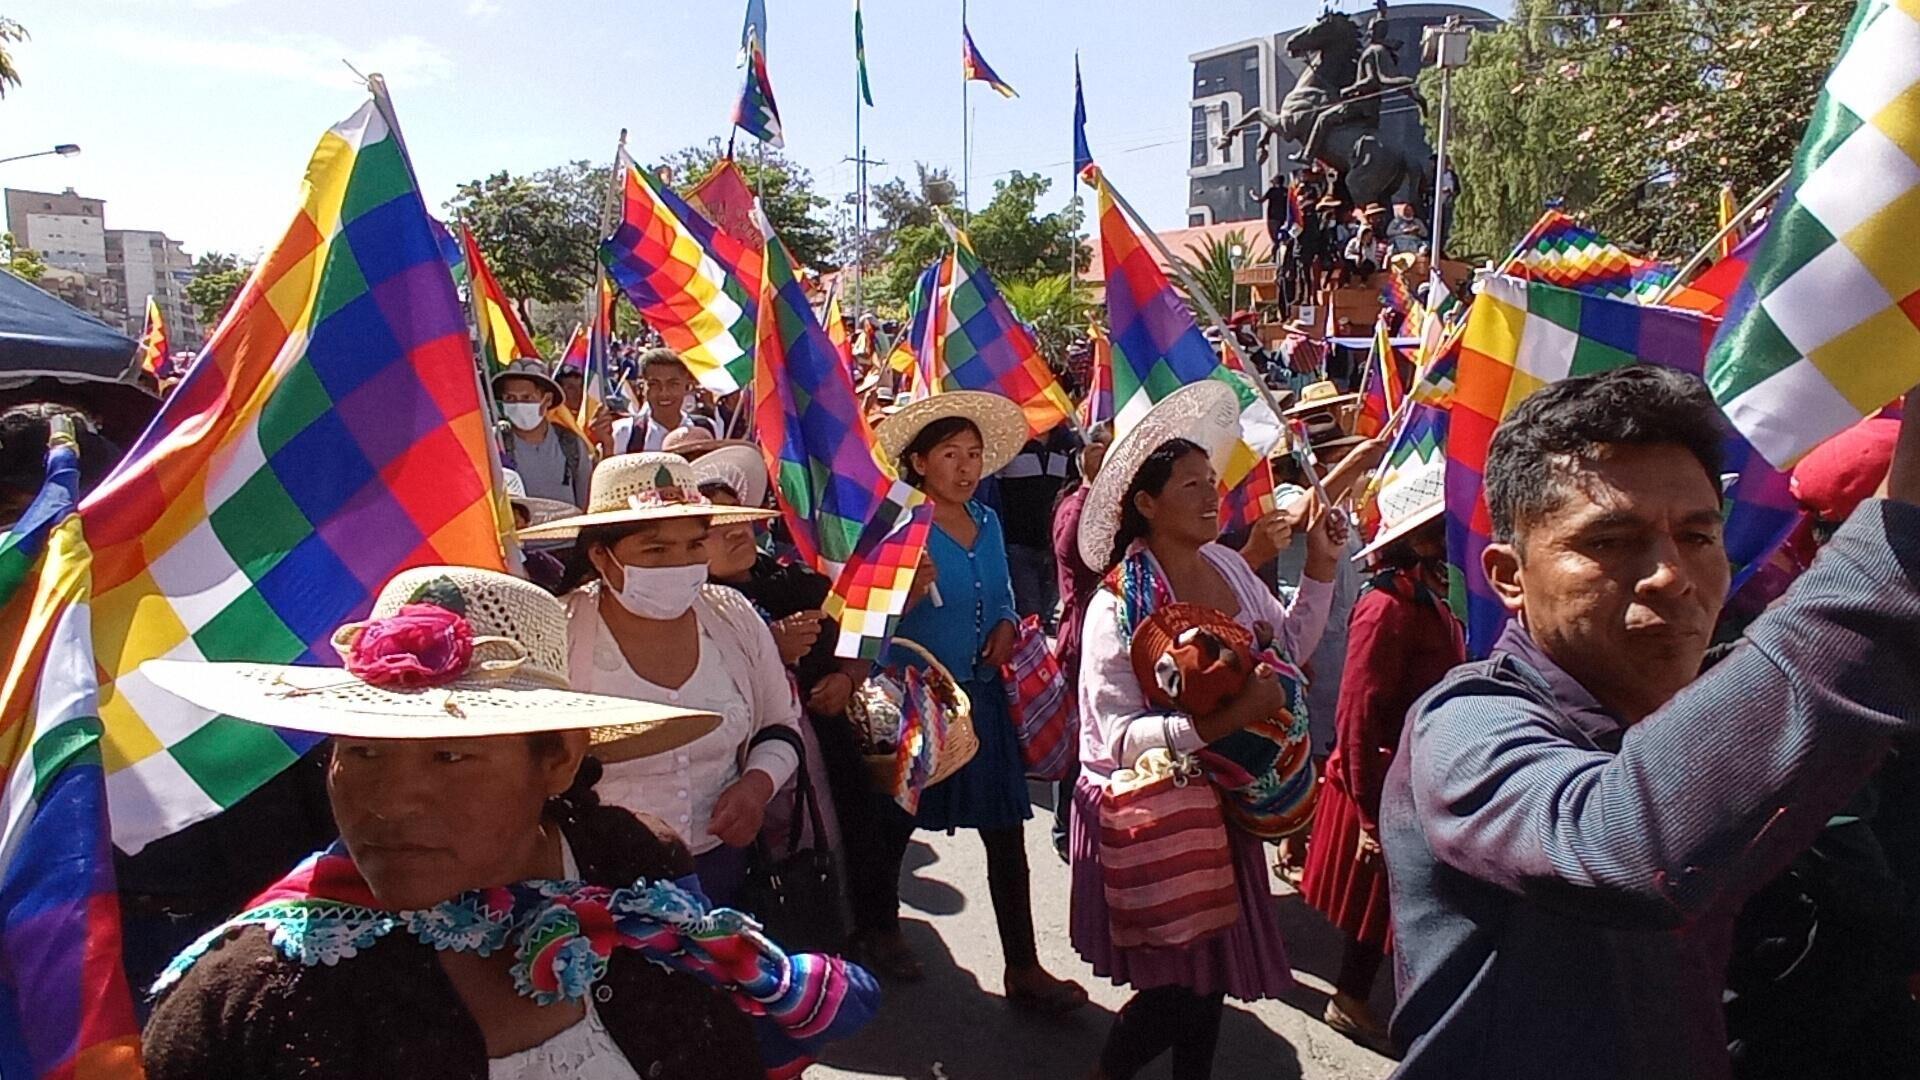 Marcha en defensa de la wiphala en Bolivia - Sputnik Mundo, 1920, 13.10.2021